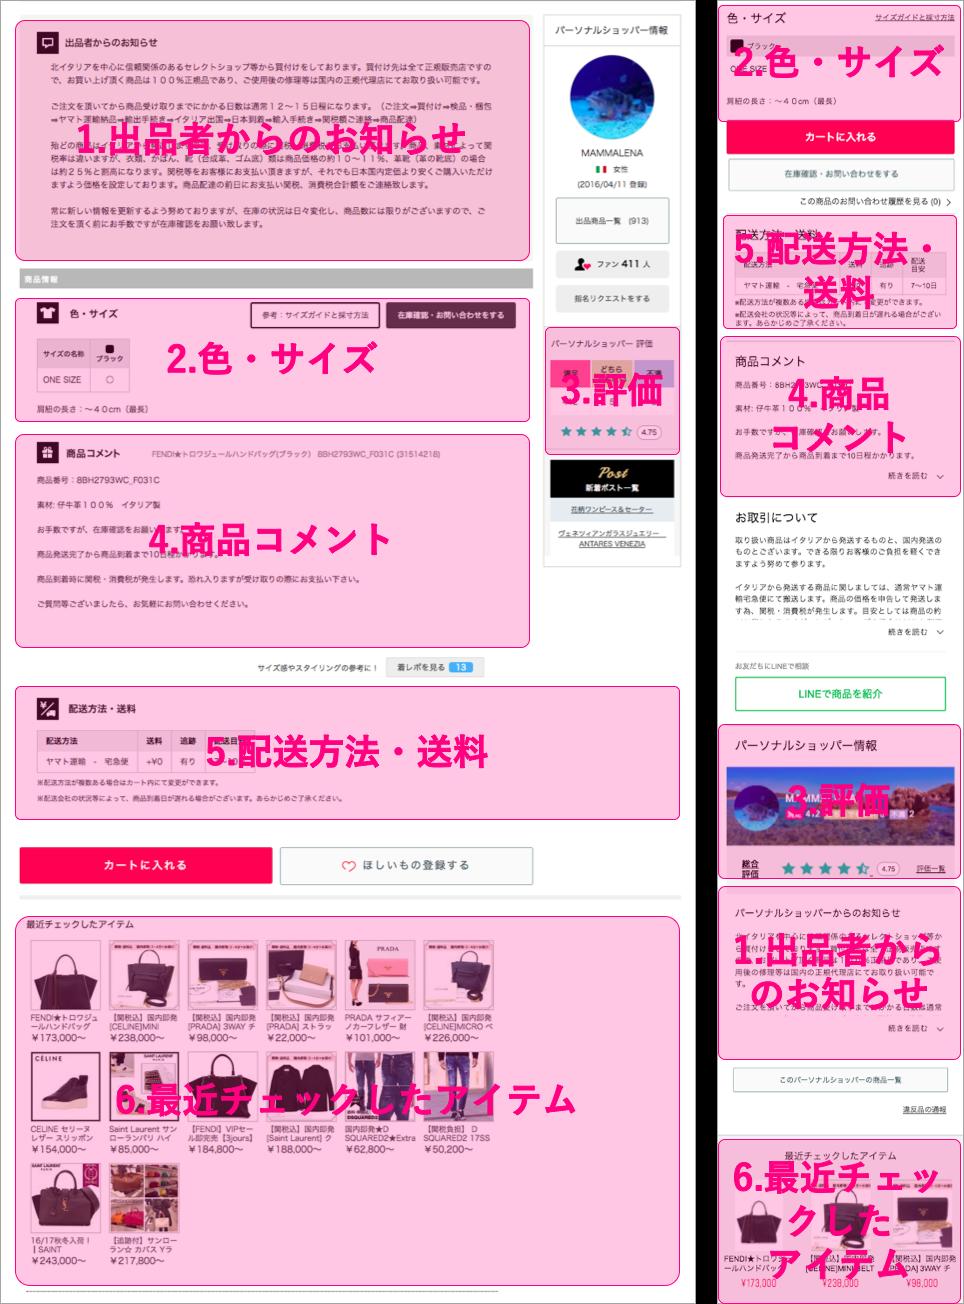 BUYMAのPC版とスマホ版の商品詳細ページの全カテゴリを比較